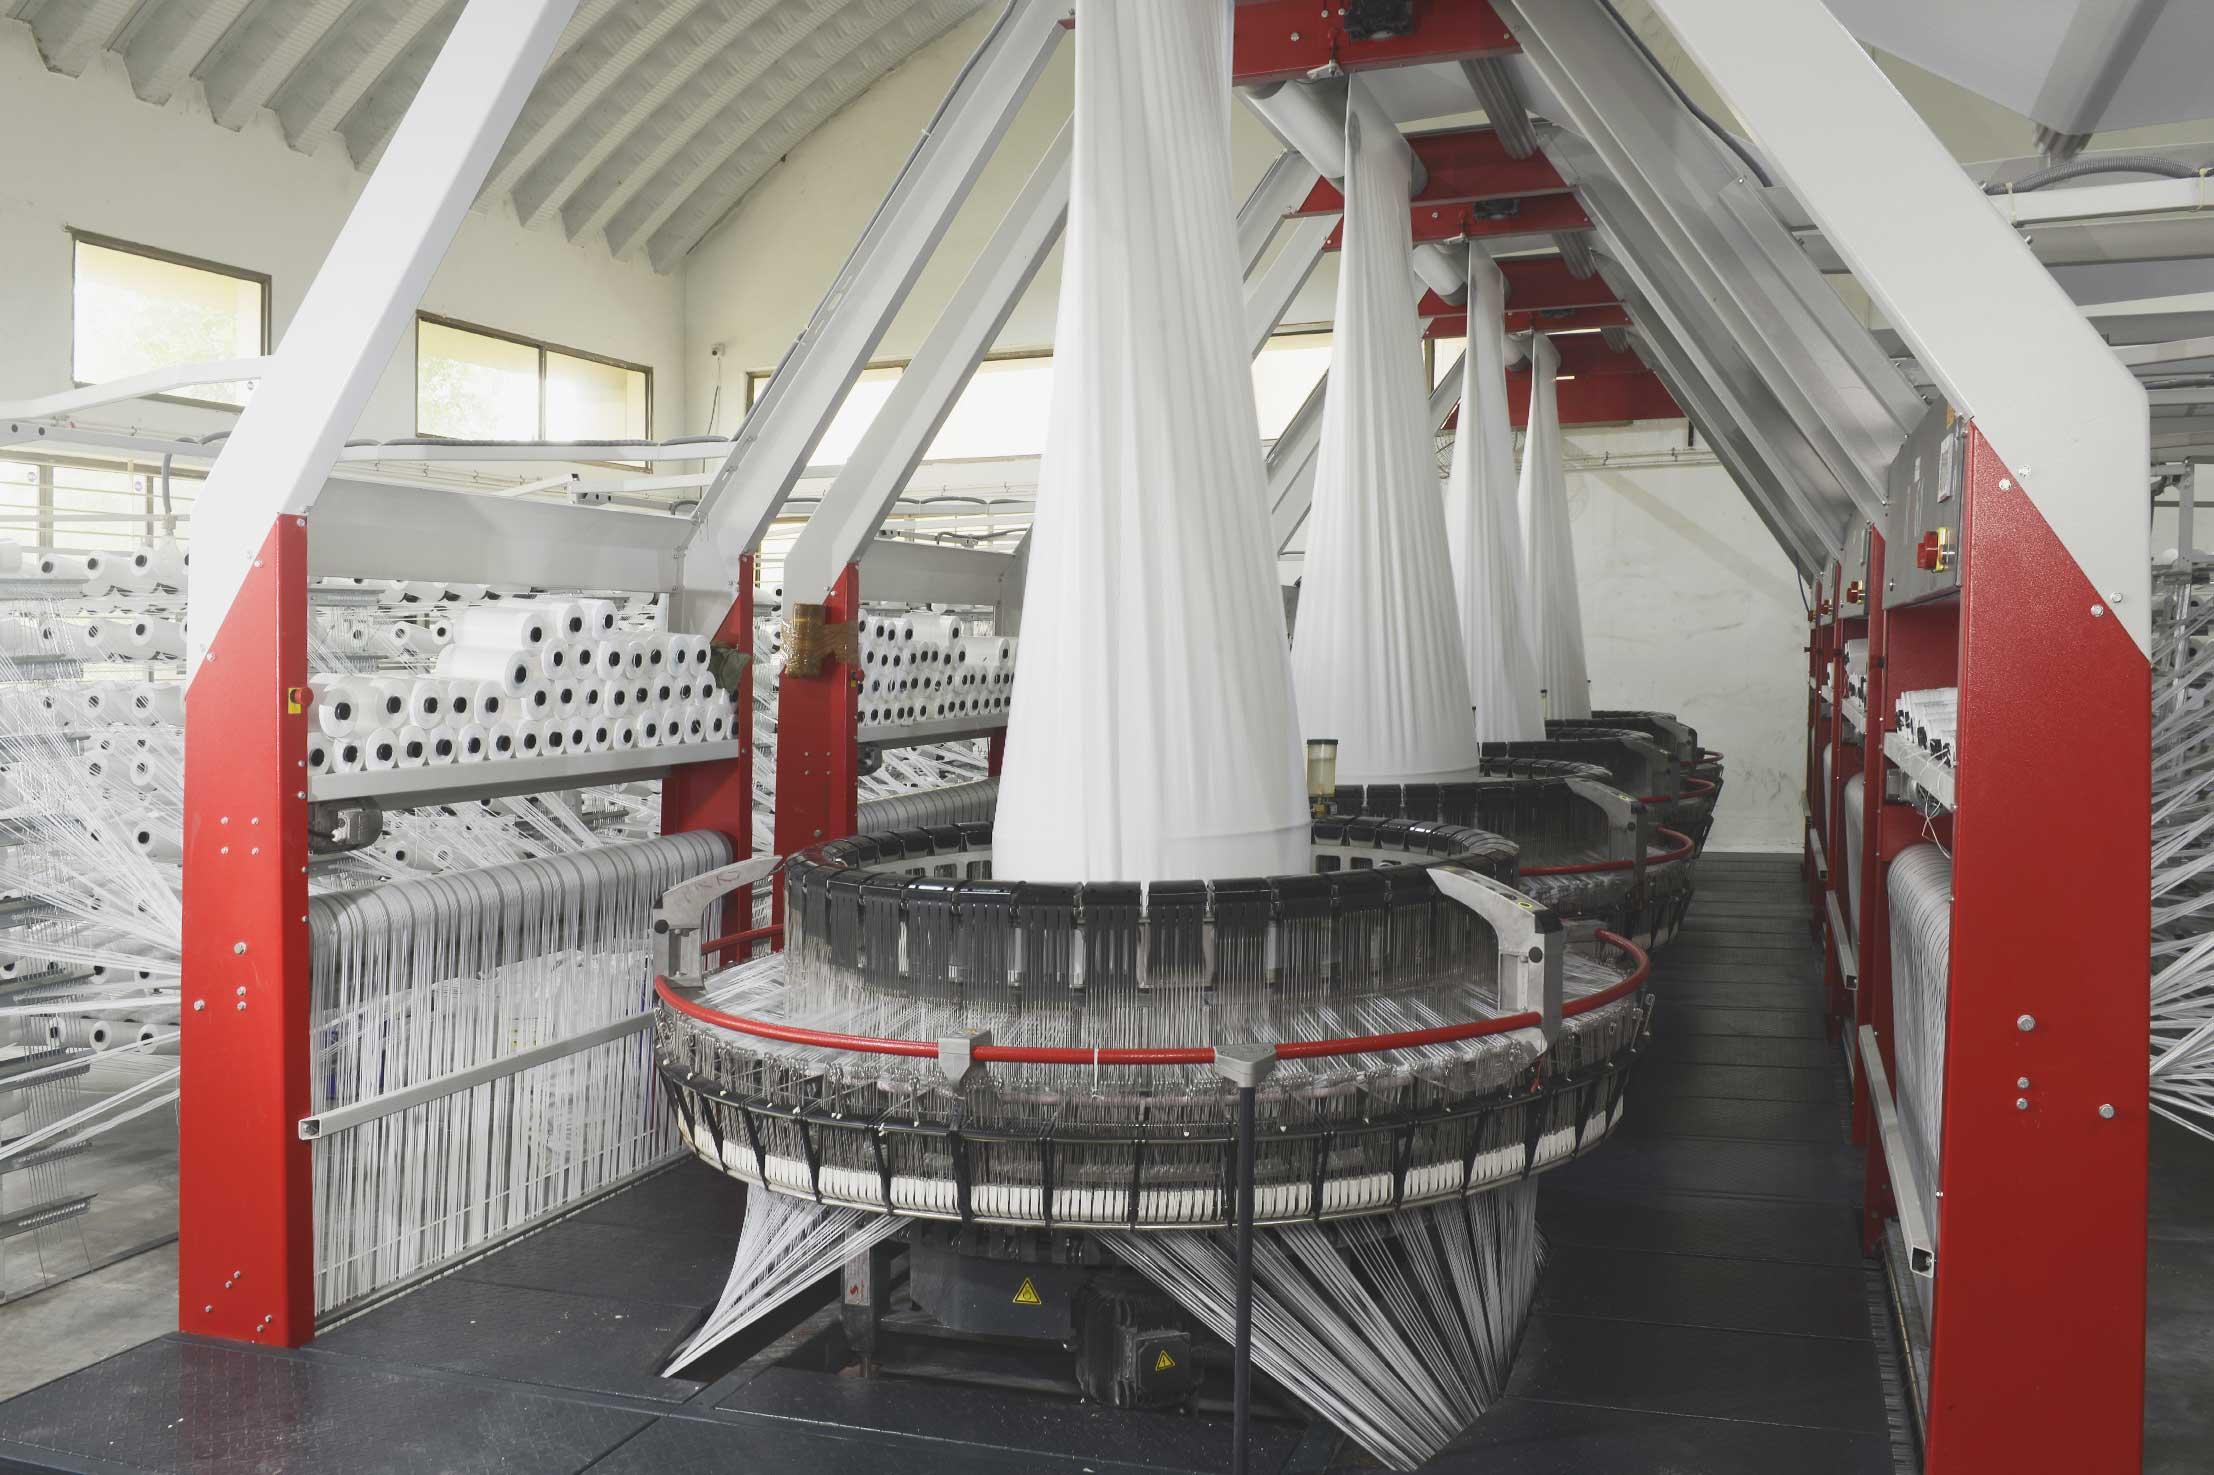 kaypee circular looms